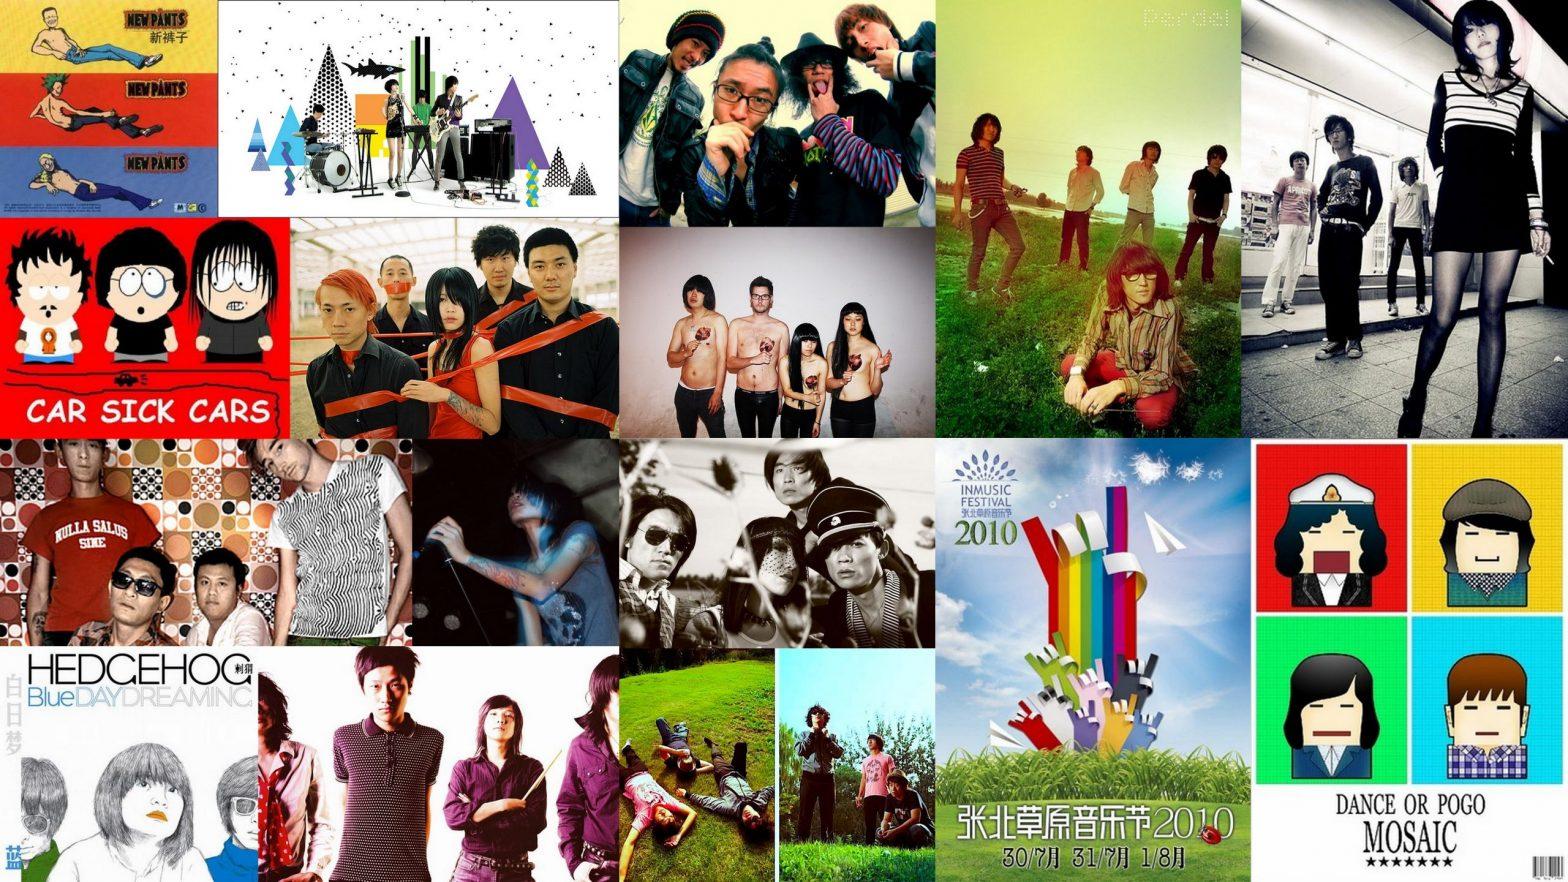 haoting chinese indie rock music compilation / китайская музыка в Магазете